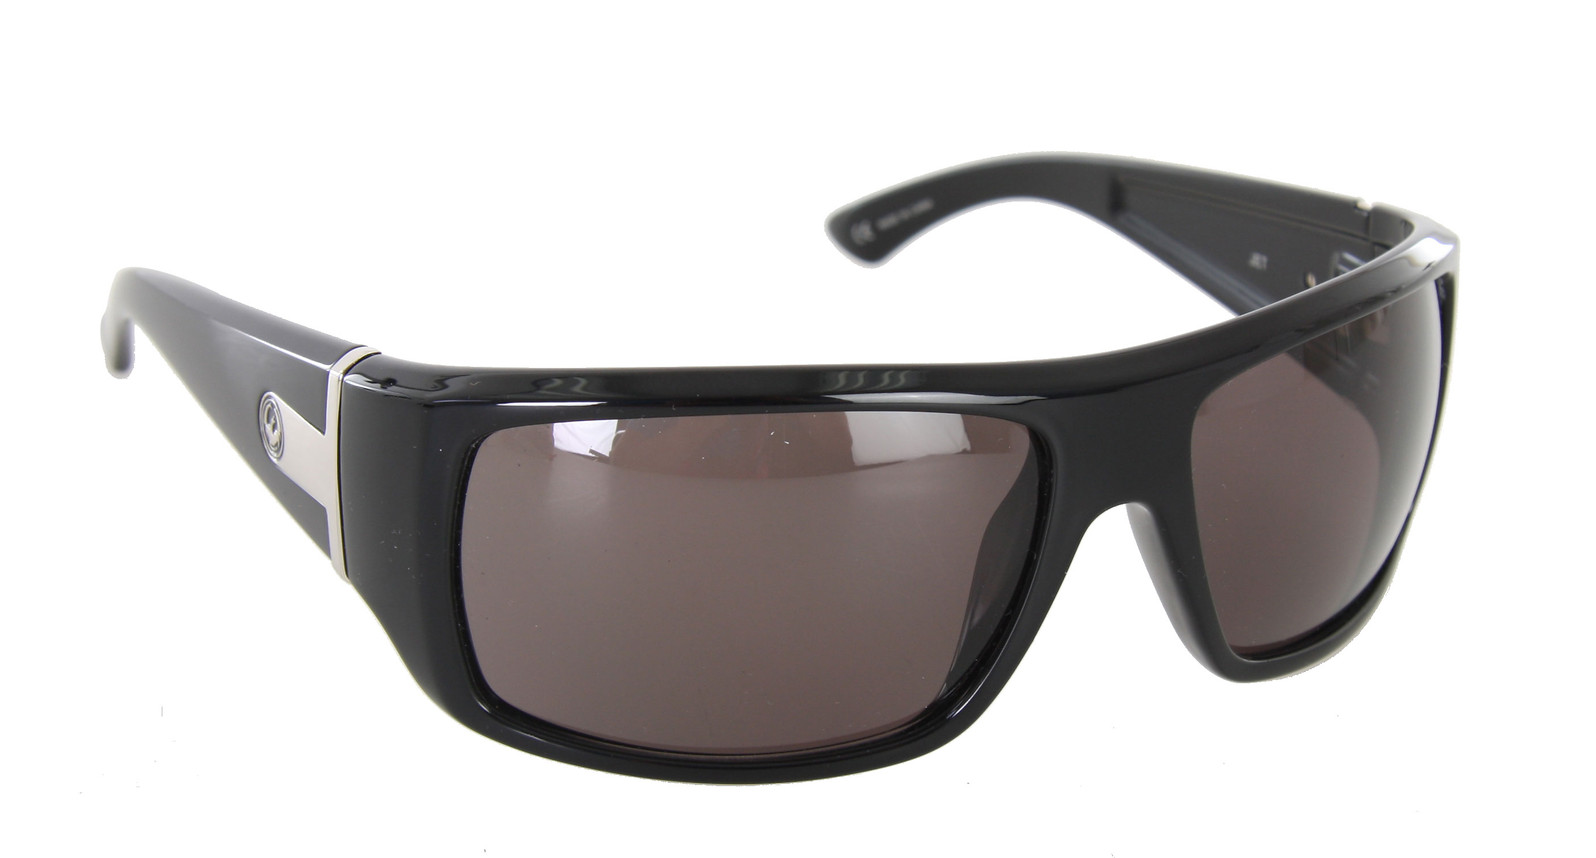 Dragon Vantage Sunglasses Jet Grey  dragon-vantage-sngls-jetgry-10.jpg